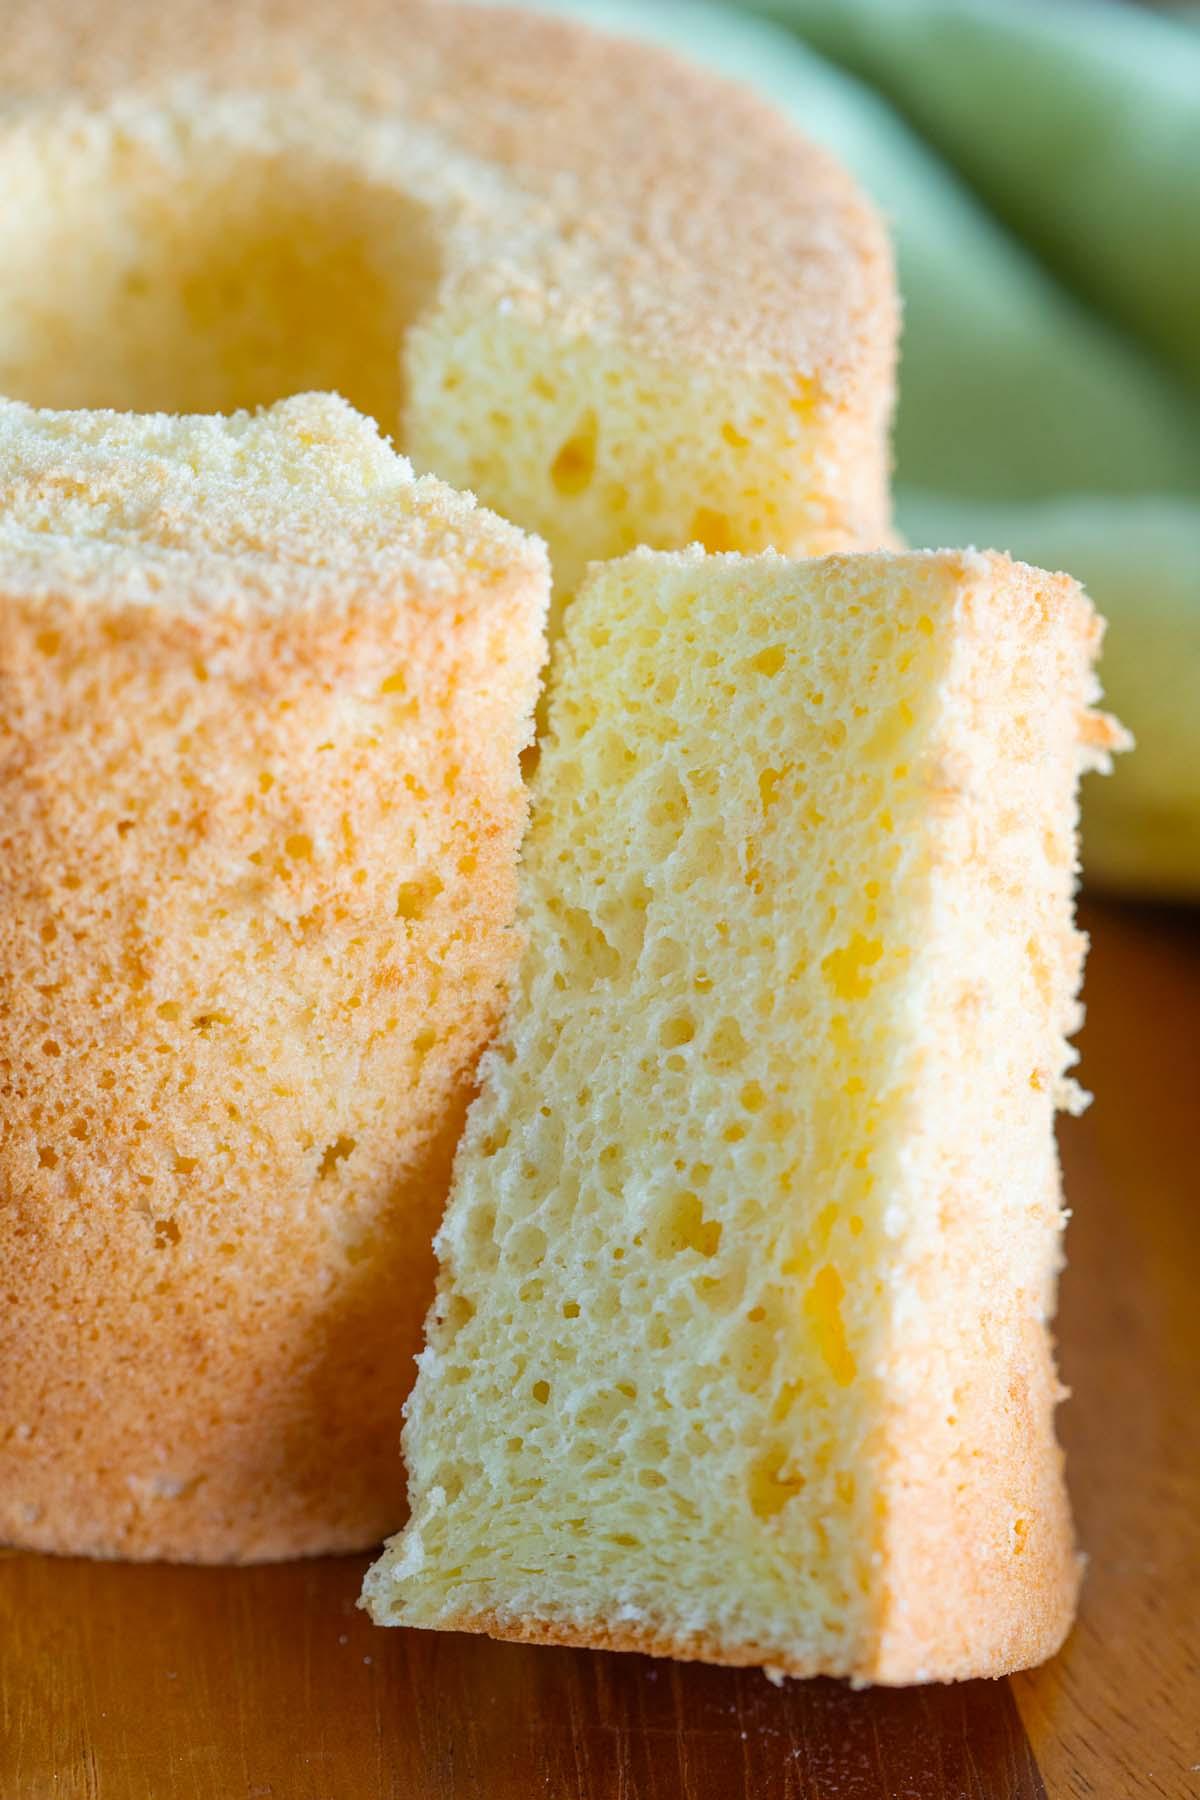 Orange chiffon cake, ready to serve.